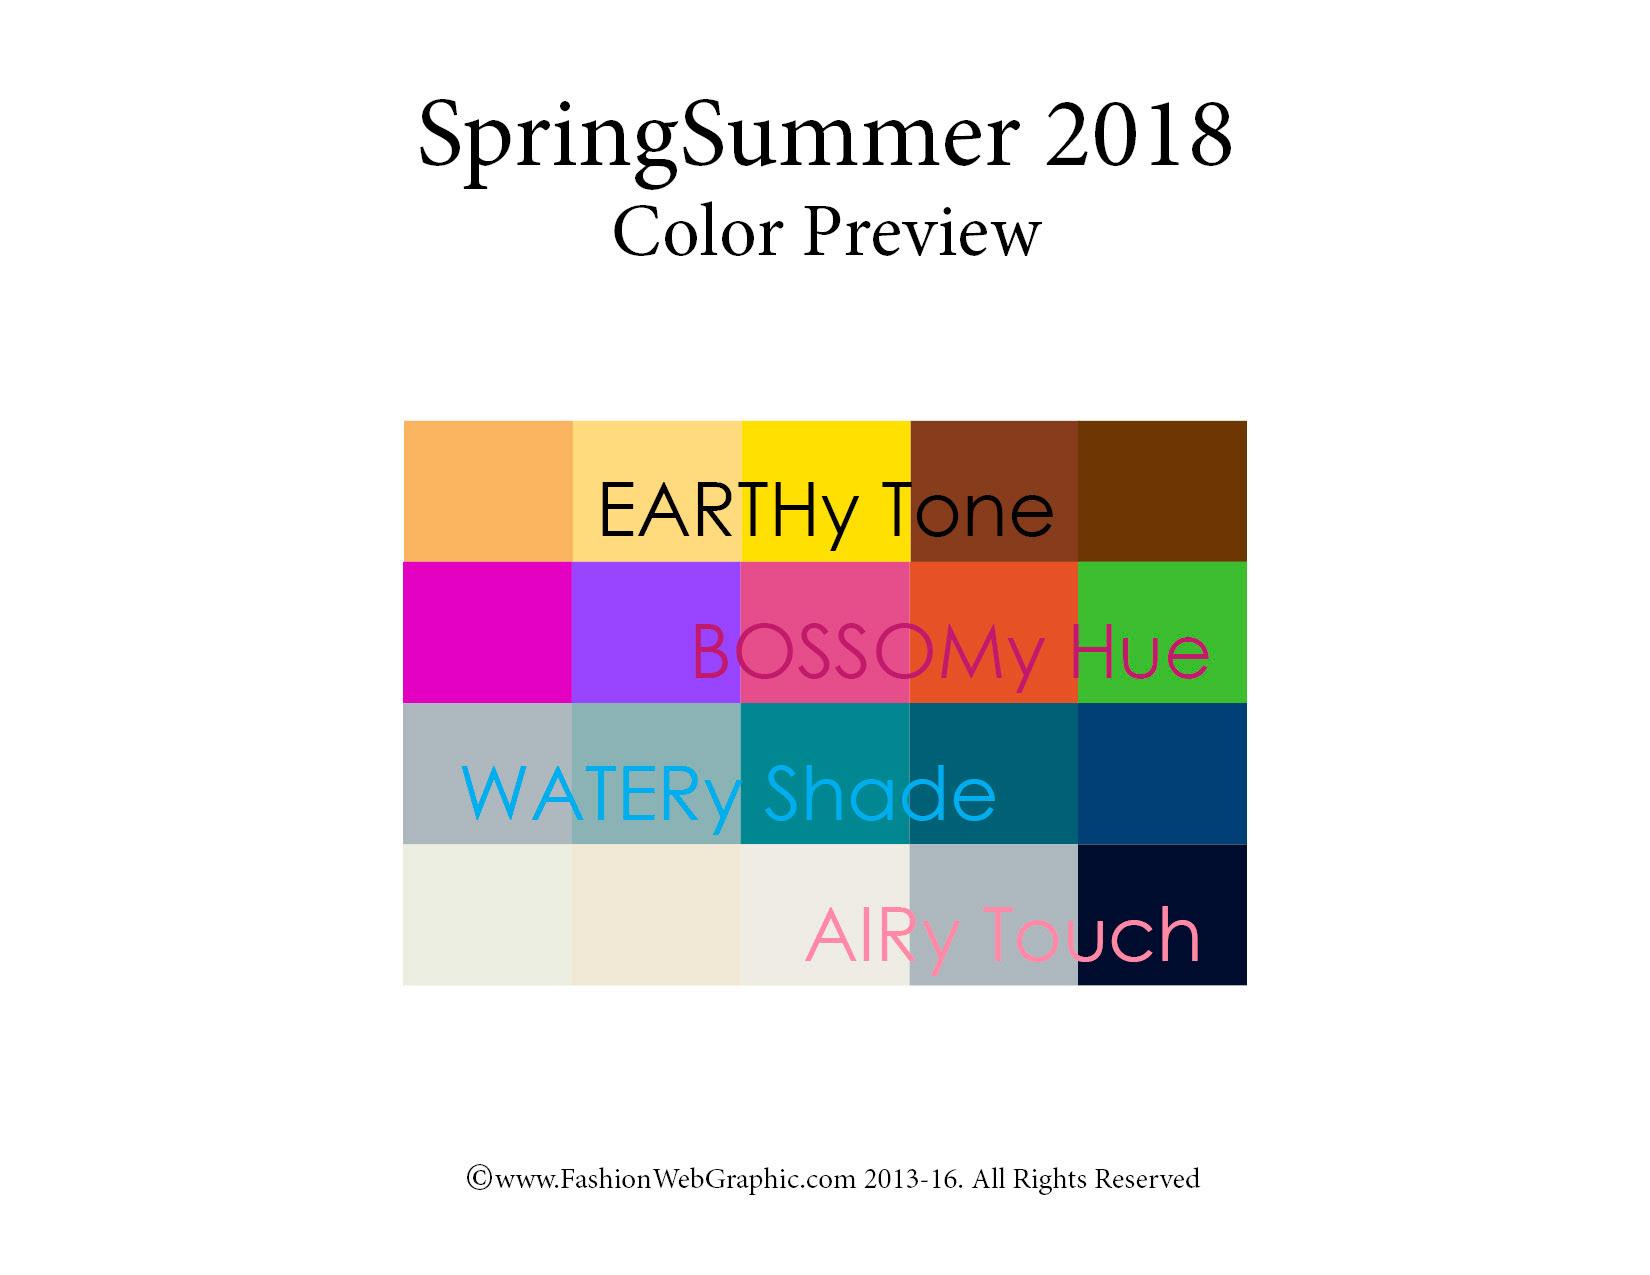 Springsummer 2018 Trend Forecasting Is